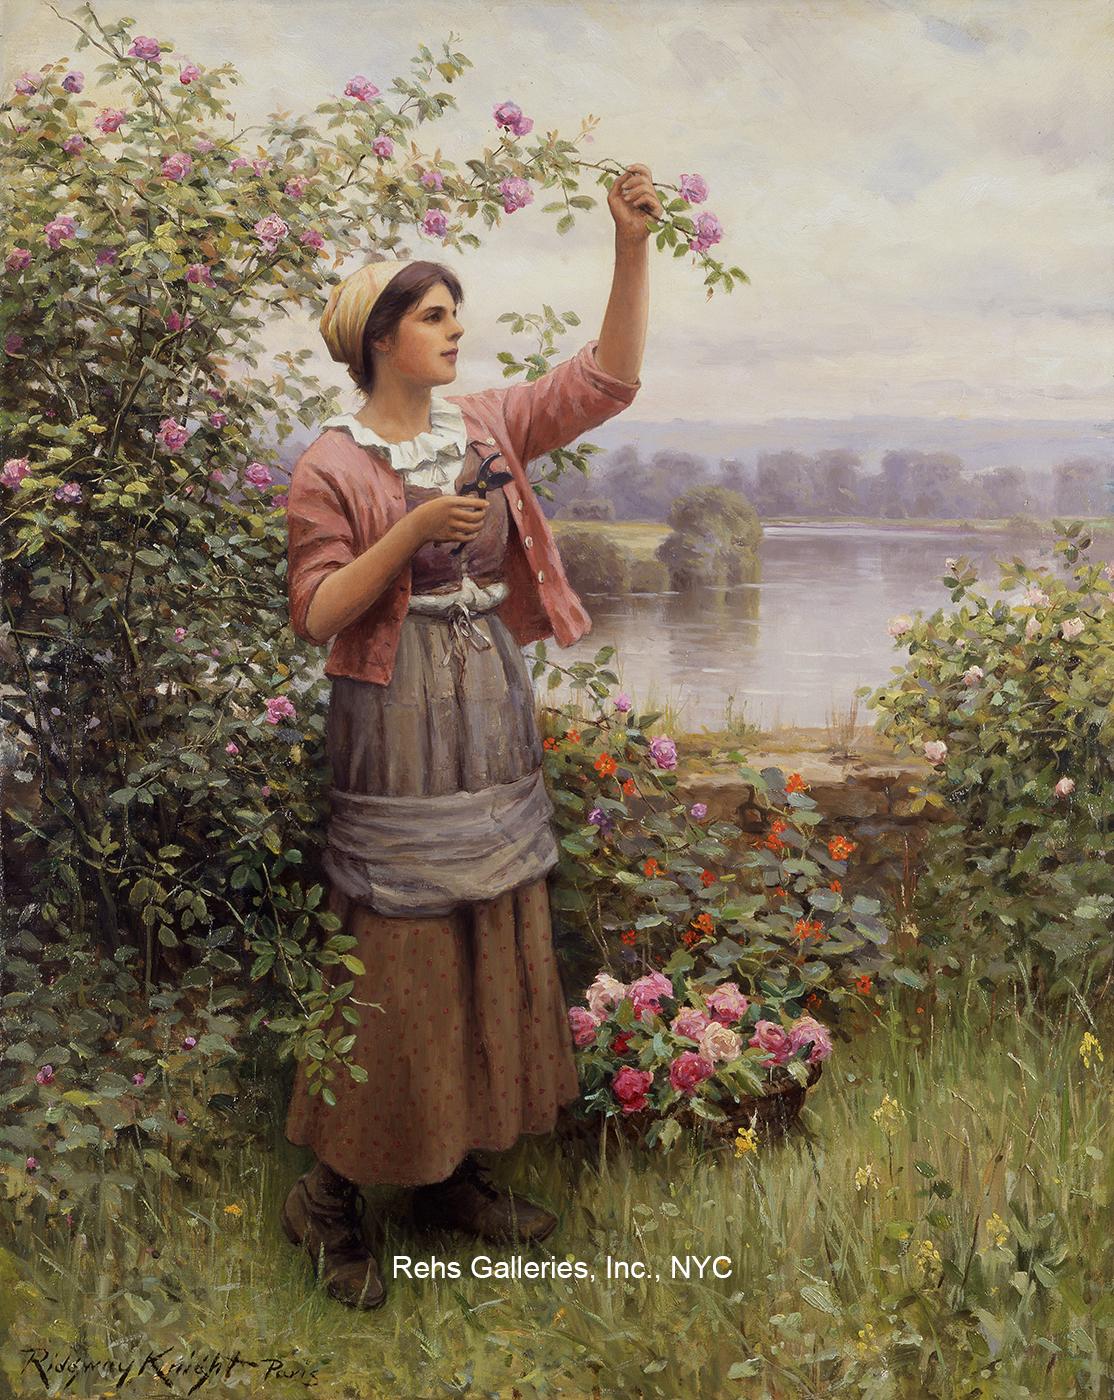 daniel_ridgway_knight_a3246_gathering_roses_wm.jpg